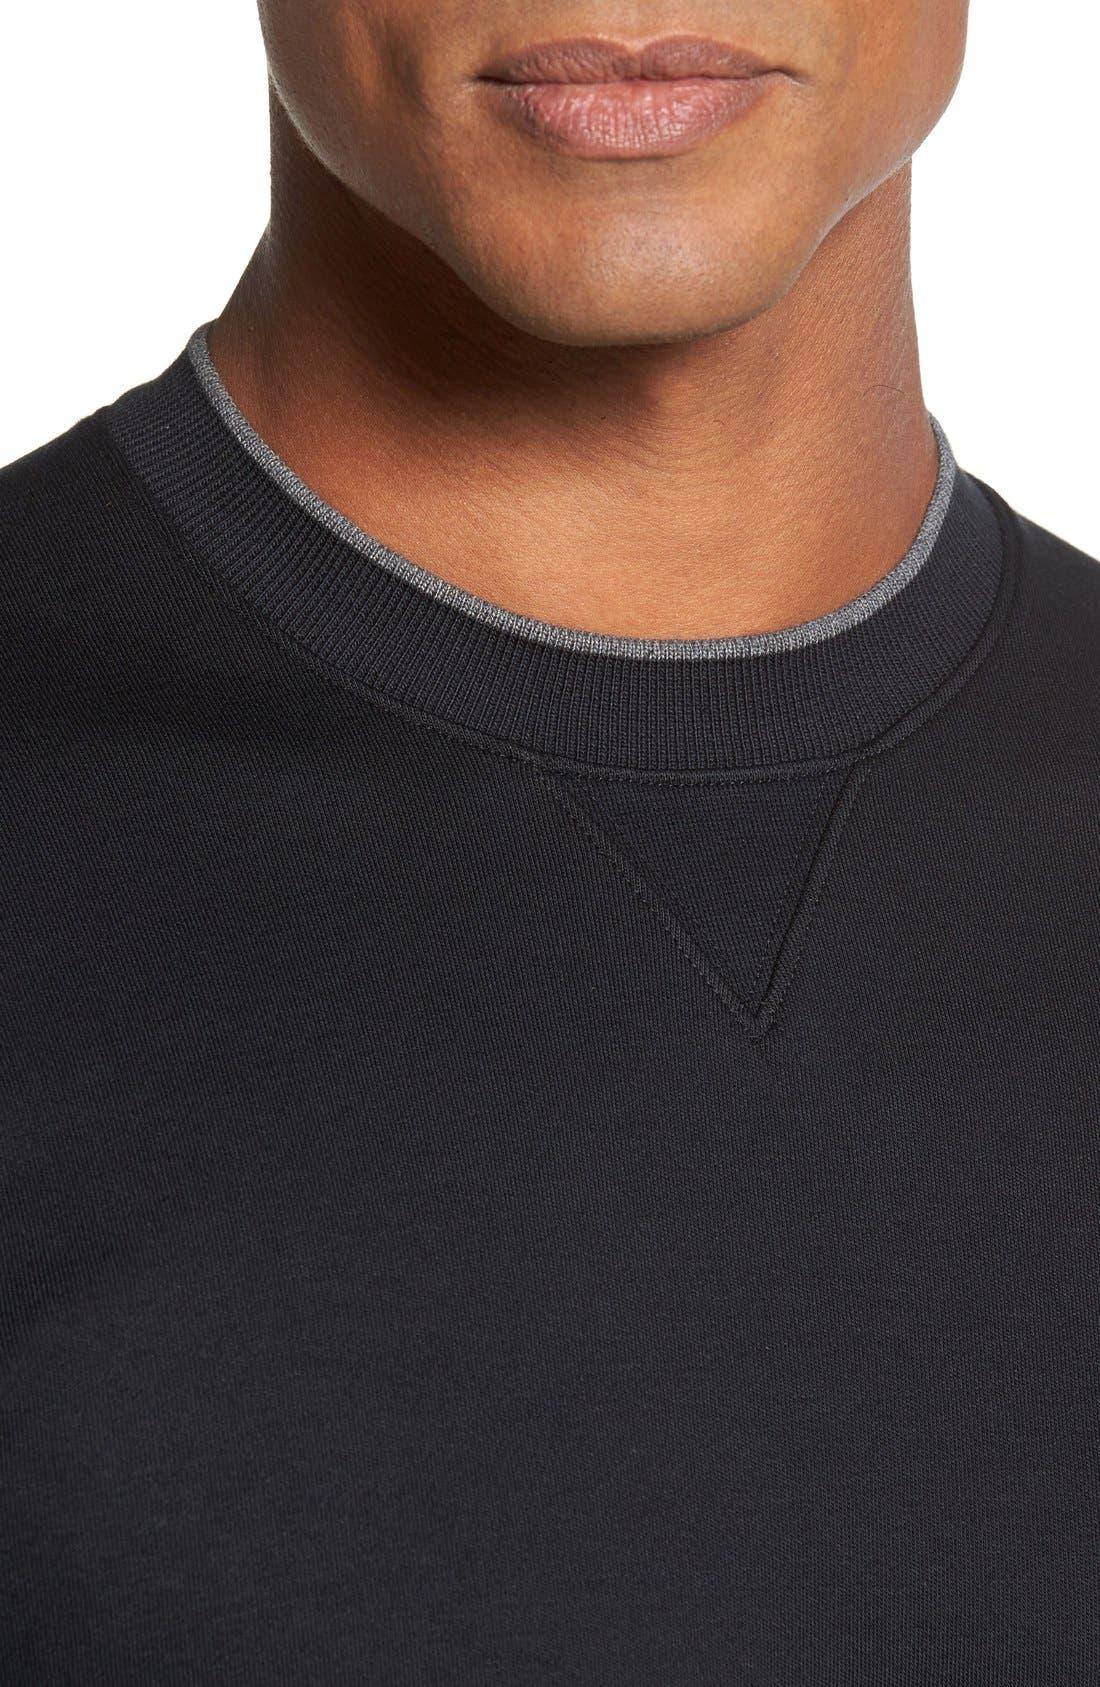 'Walker' Tipped Pima Cotton Long Sleeve T-Shirt,                             Alternate thumbnail 4, color,                             001